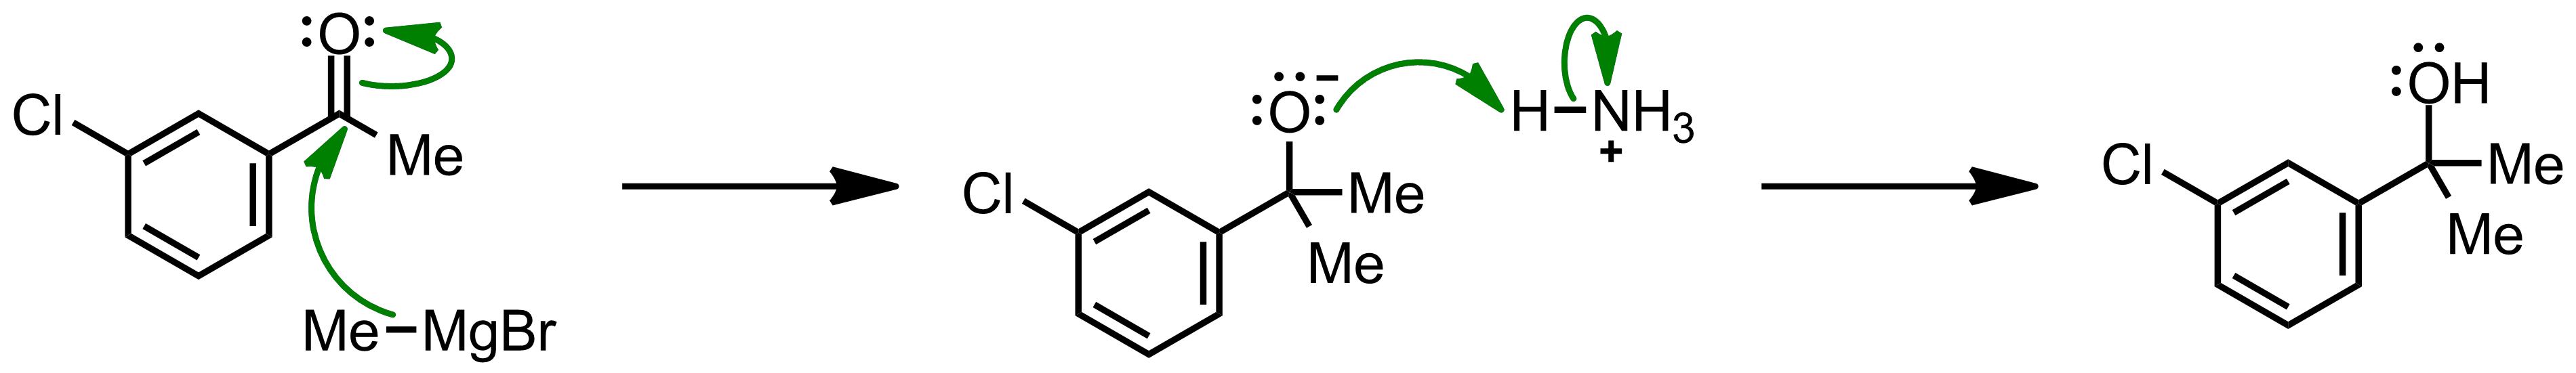 Mechanism of the Grignard Reaction